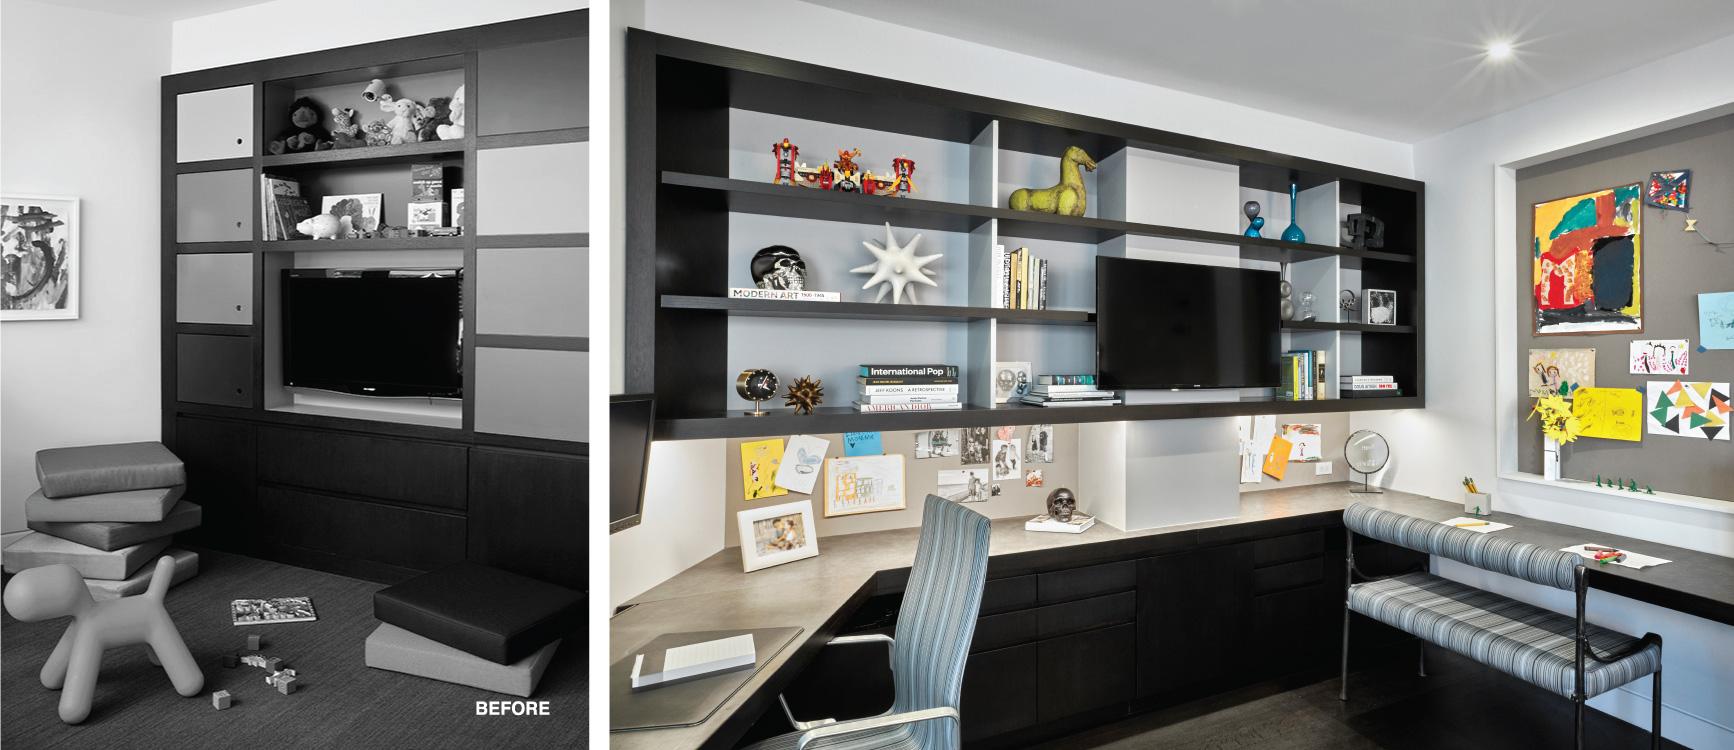 14_tribeca_park_front_loft_office_before_after.jpg